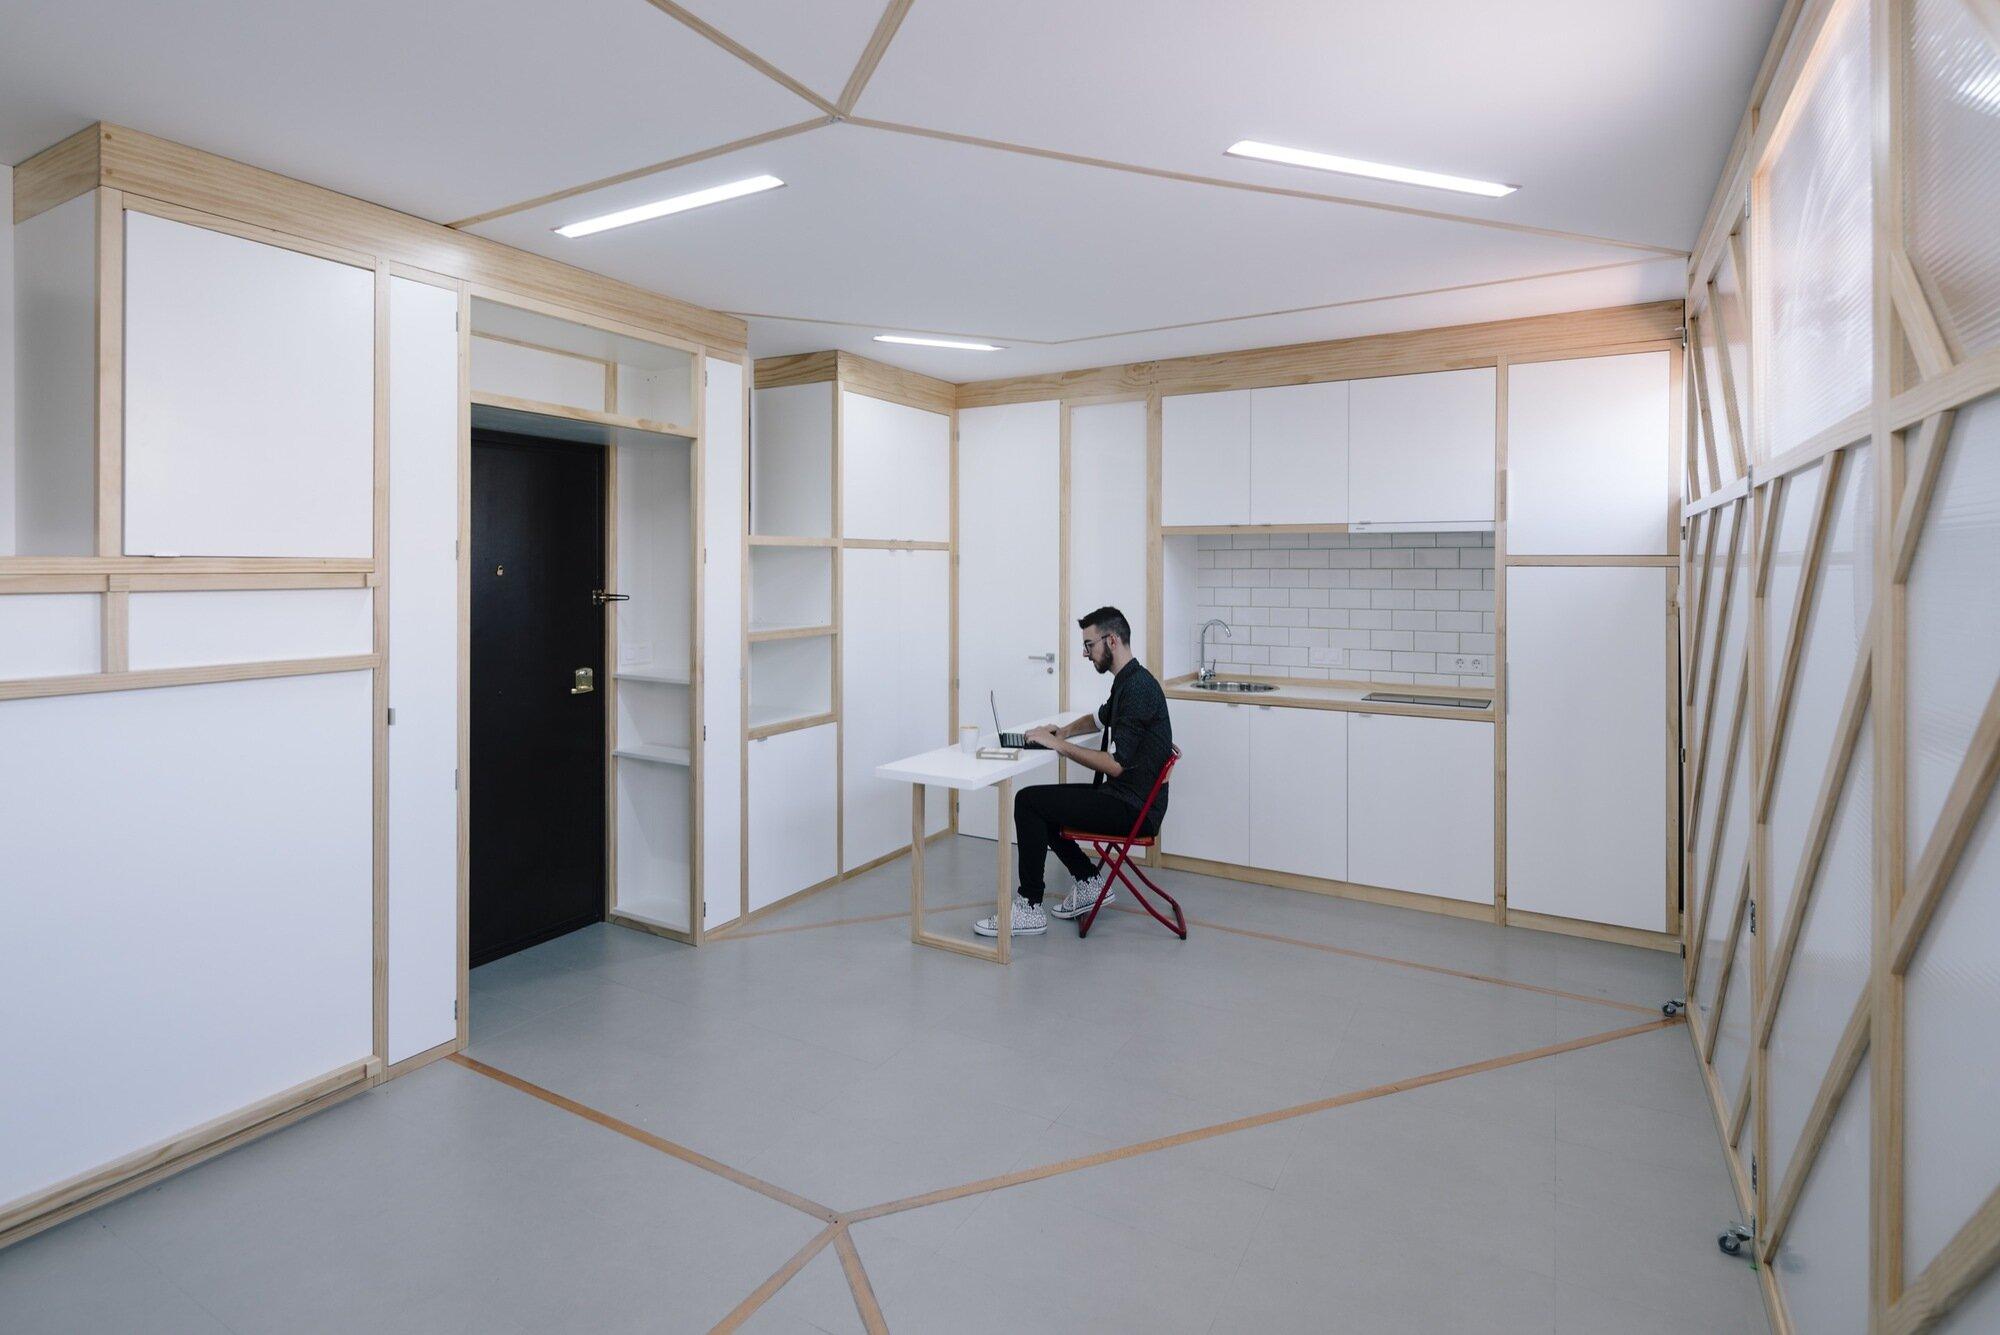 Biombombastic - elii - Spain - Kitchen and Desk - Humble Homes